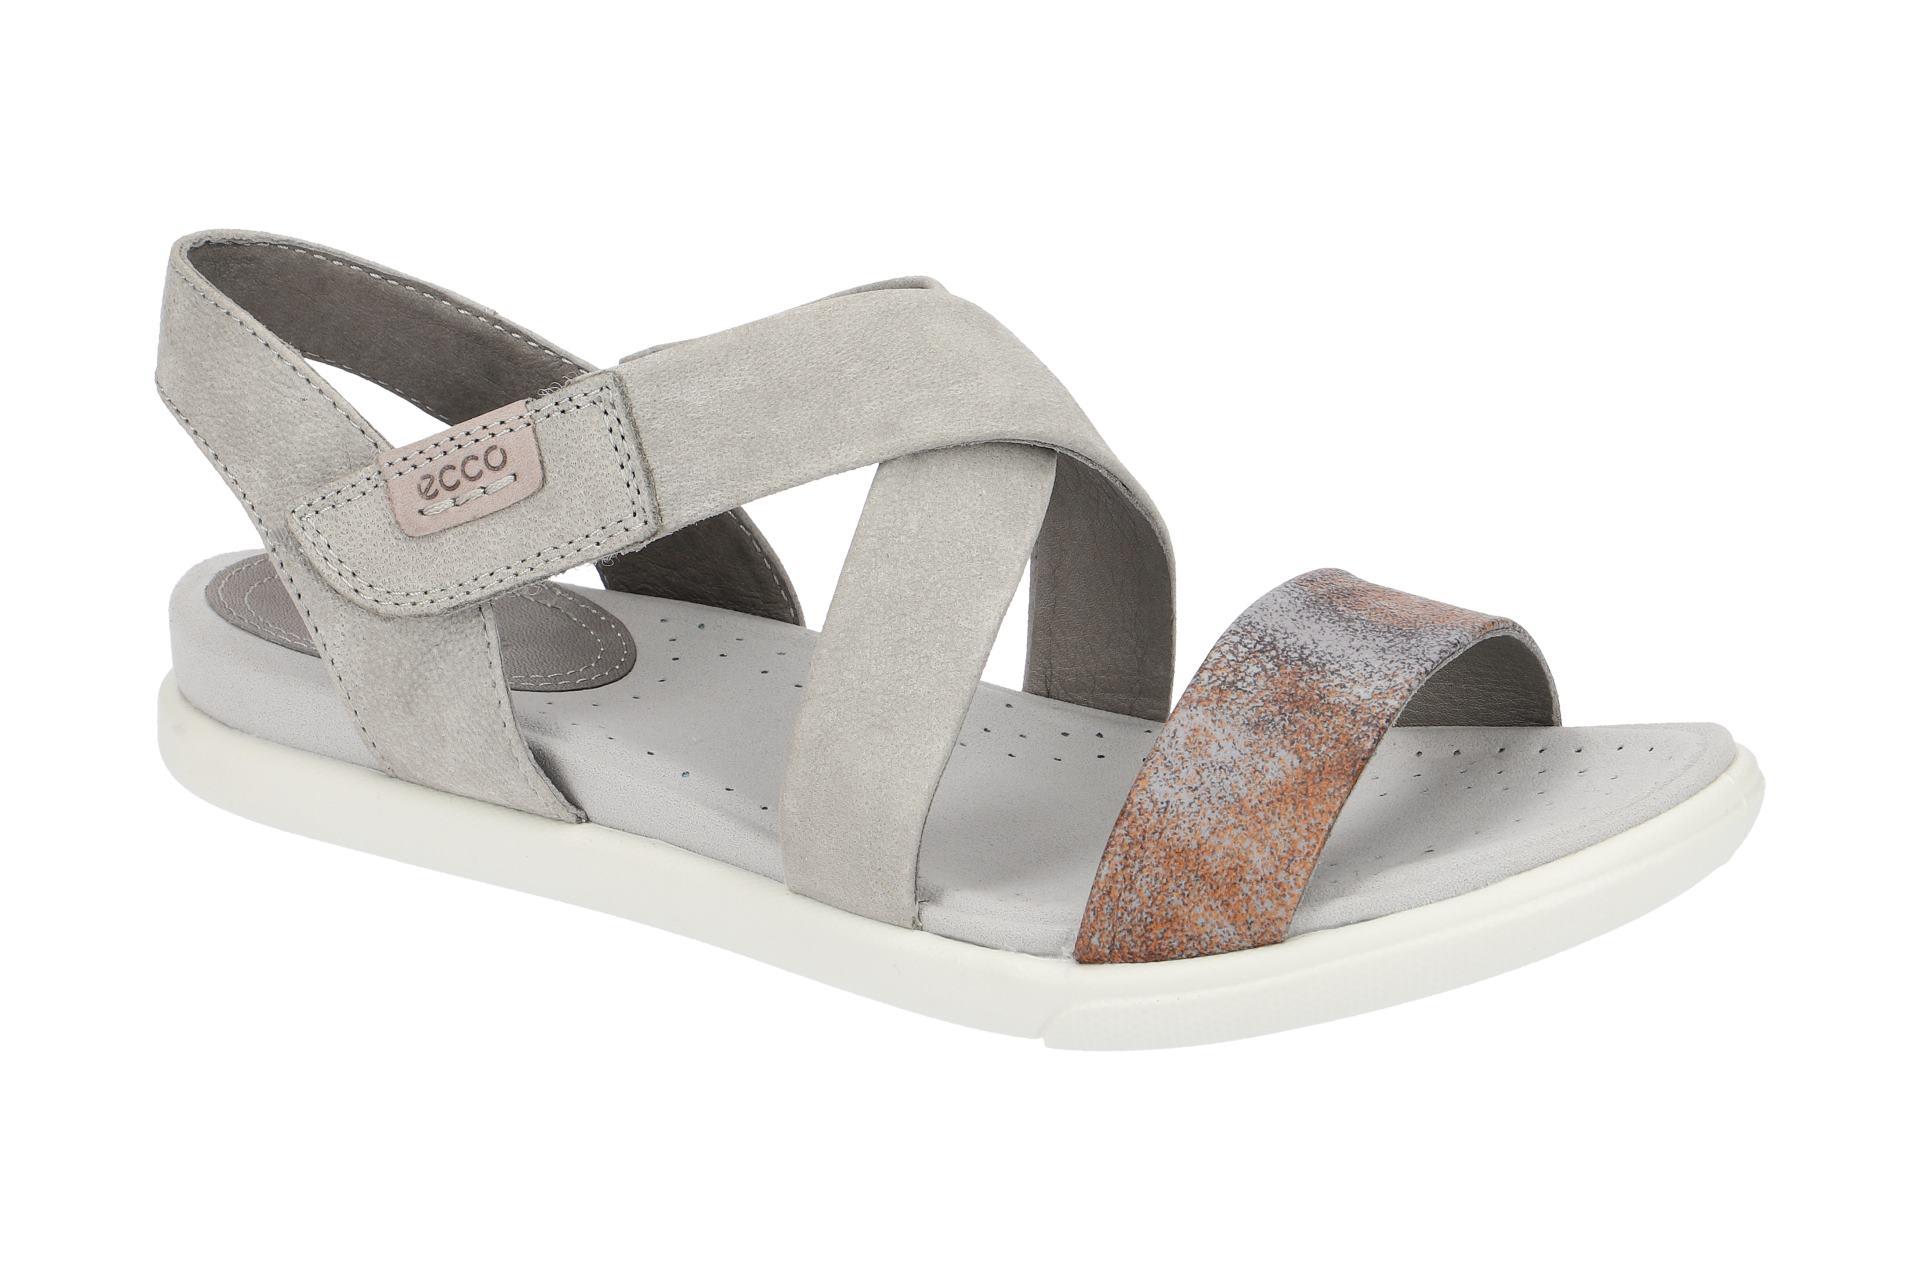 ebfc8418f8a371 Ecco Schuhe DAMARA SANDAL grau Damen Sandale Sandaletten 24827355915 ...